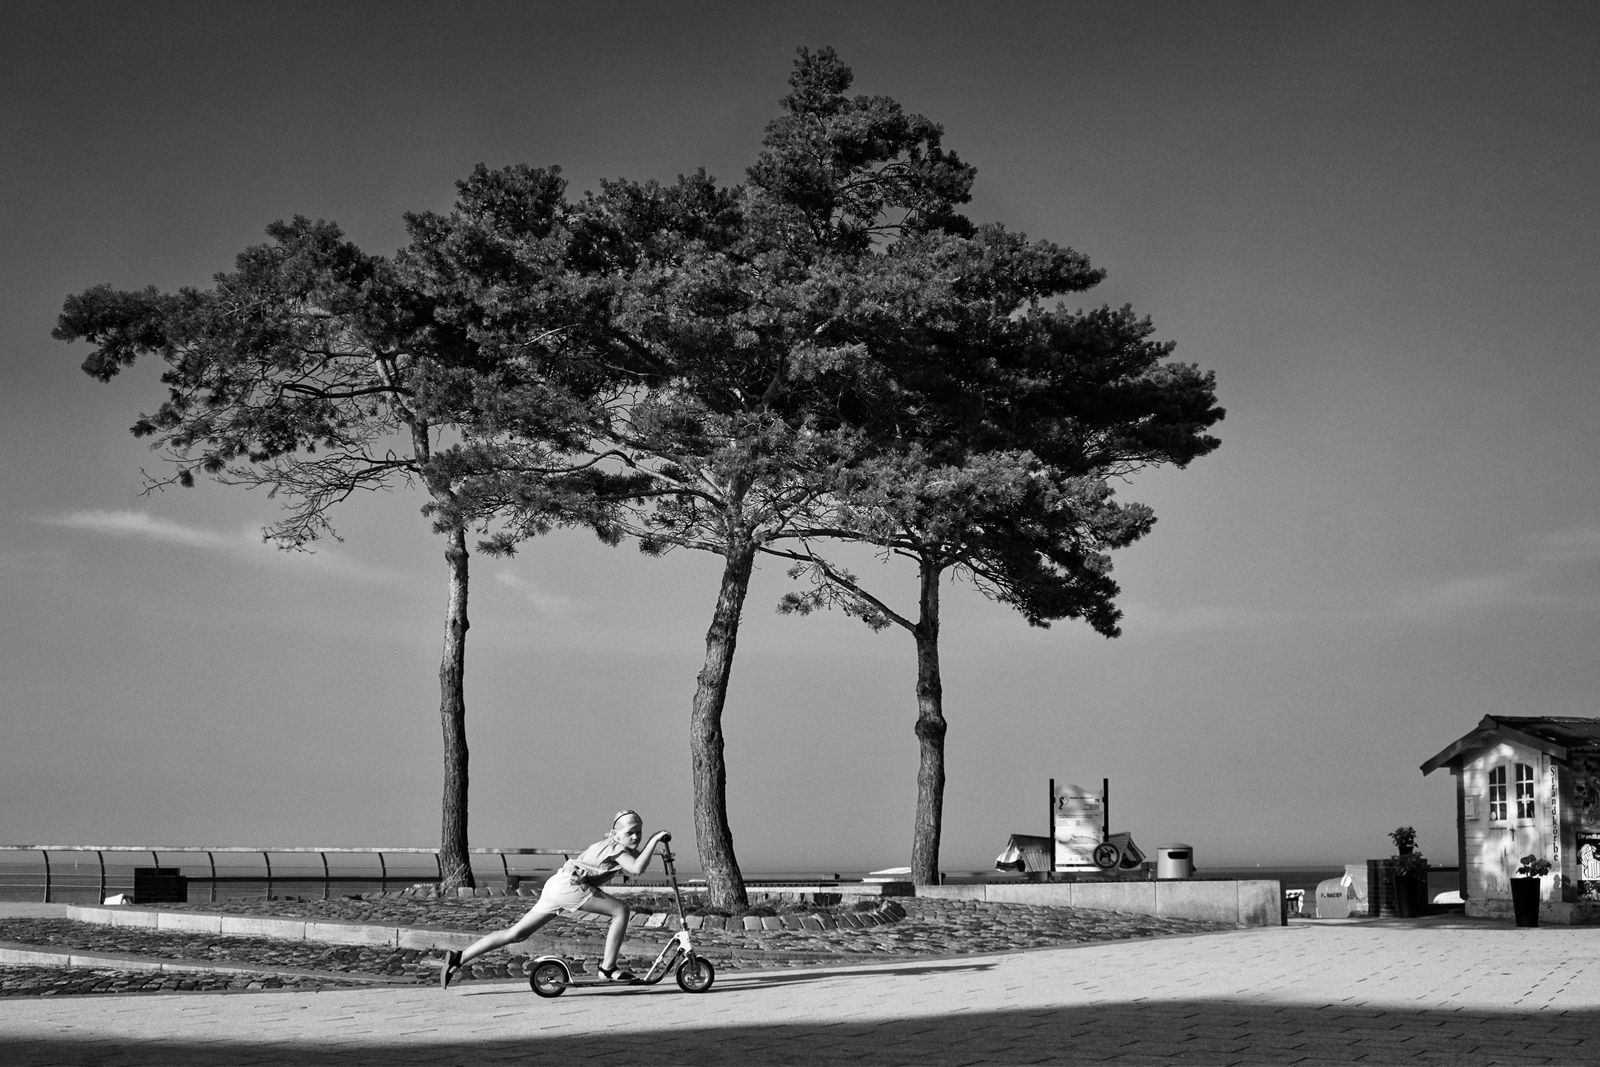 Strandpromenade in Niendorf